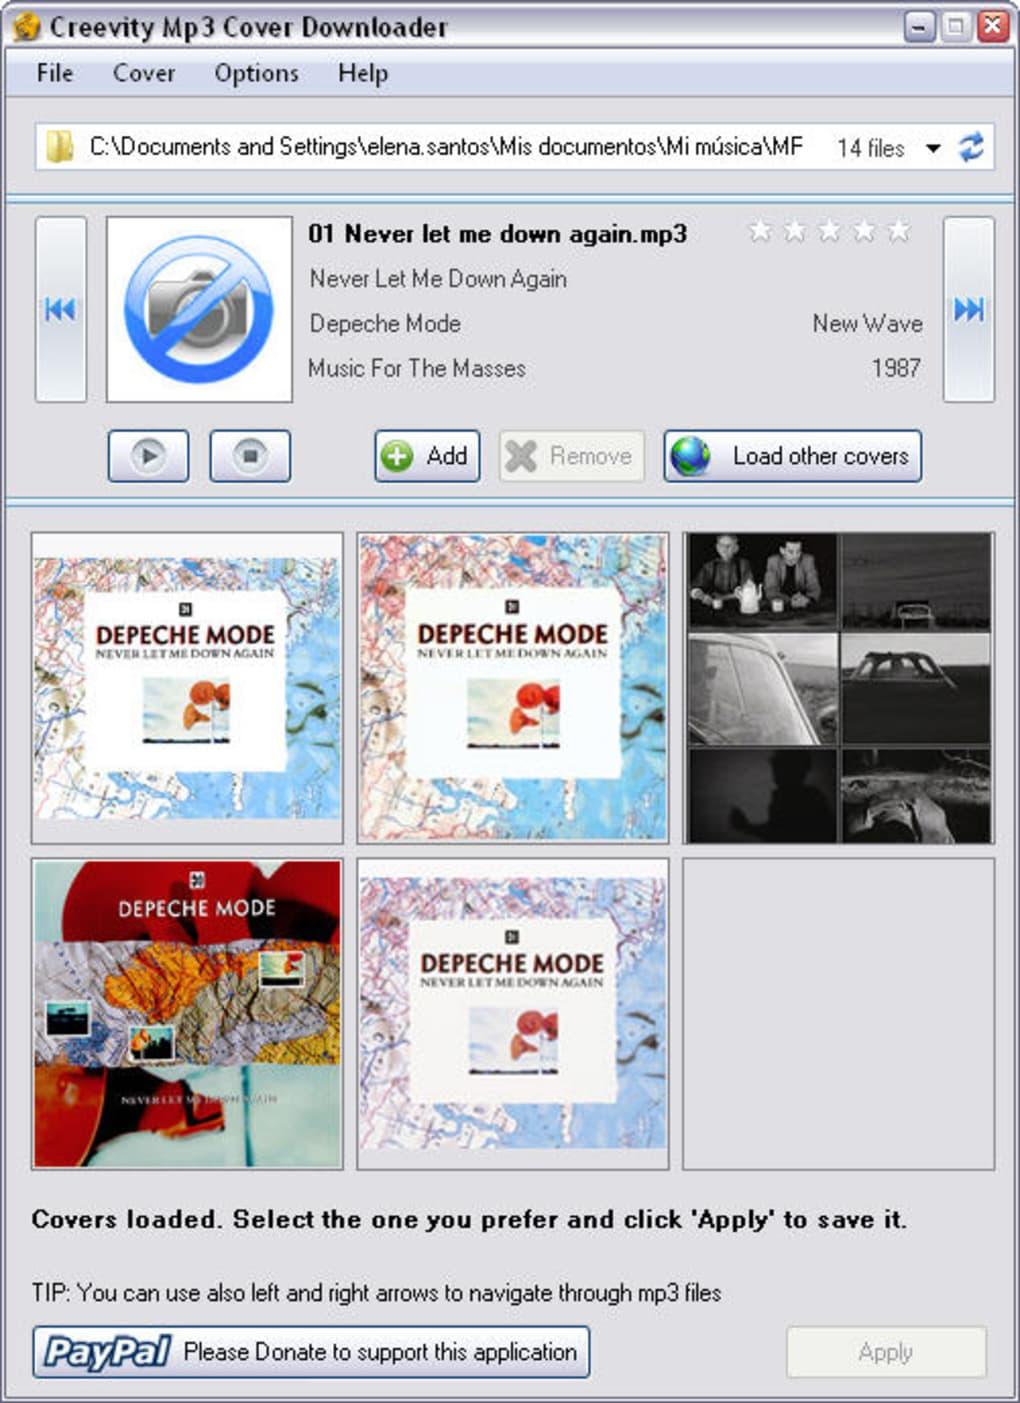 mp3 album cover downloader